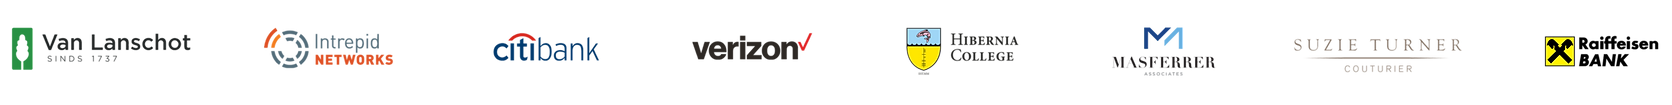 Moxtra_CustomerLogos-1-1.png